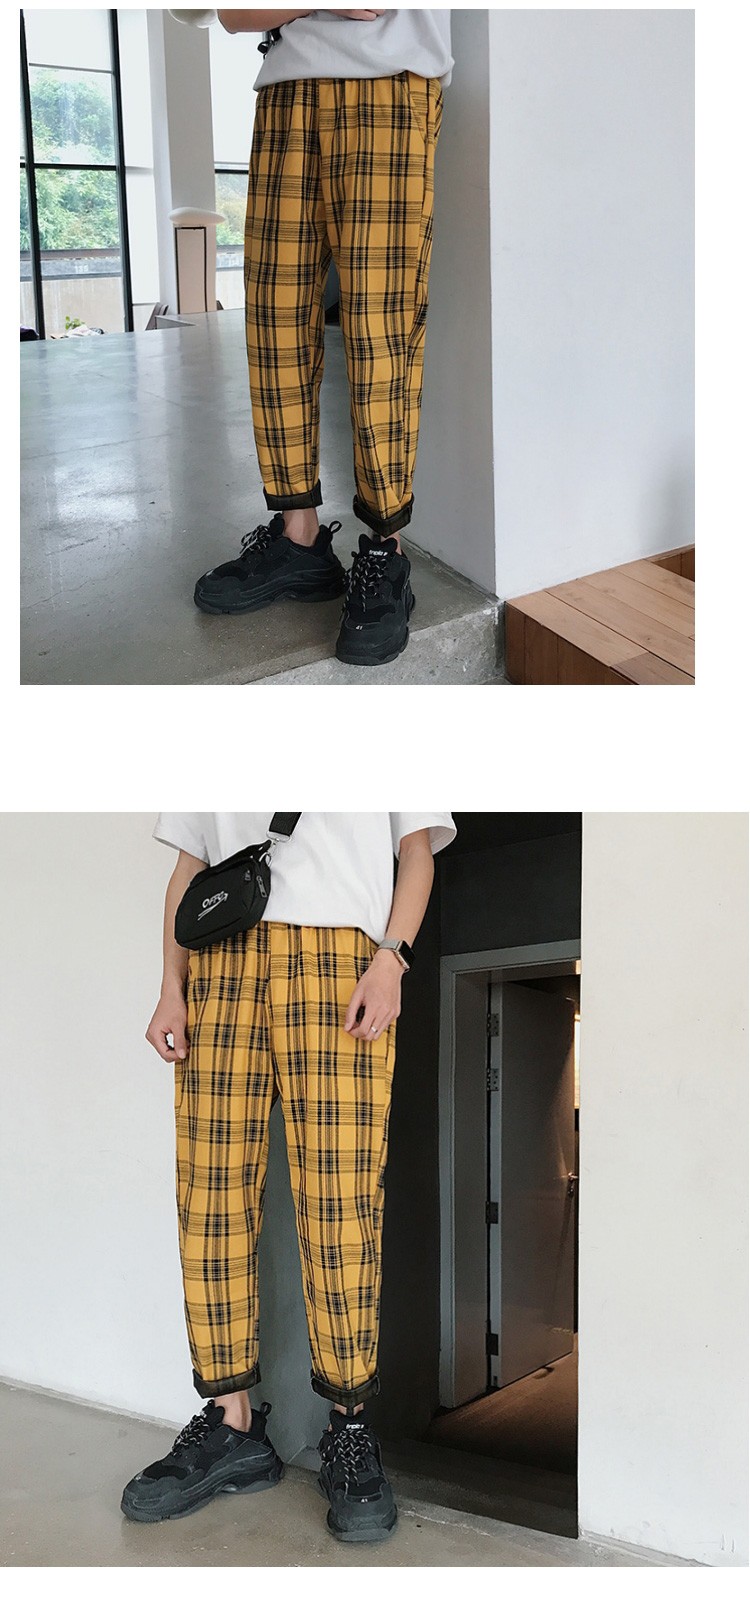 HTB1IHKmbynrK1Rjy1Xcq6yeDVXaj LAPPSTER Streetwear Yellow Plaid Pants Men Joggers 2019 Man Casual Straight Harem Pants Men Korean Hip Hop Track Pants Plus Size